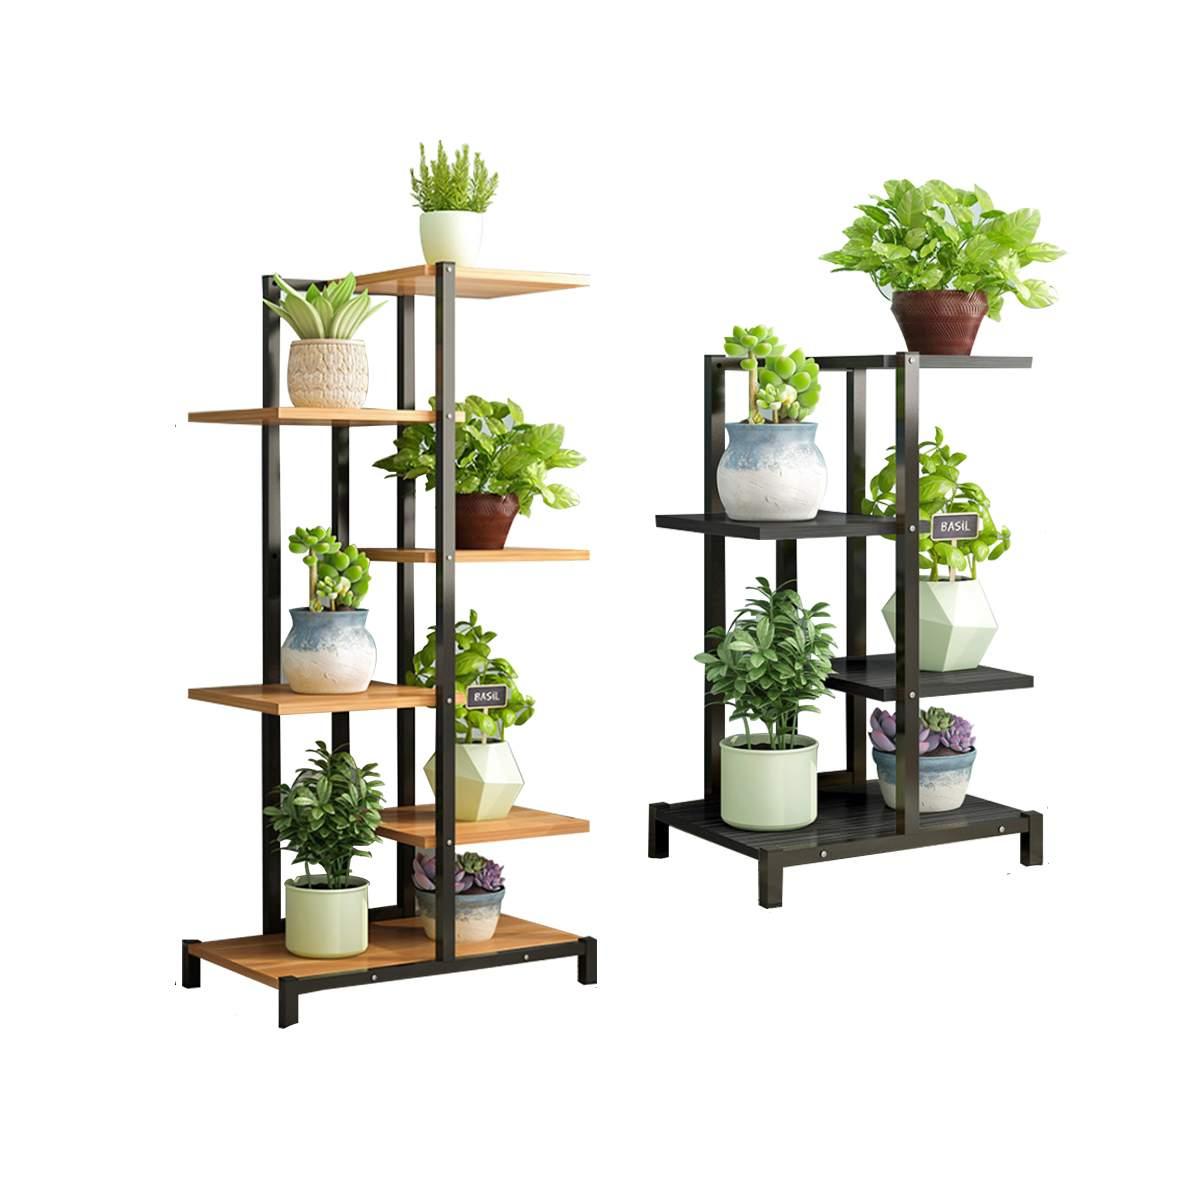 Multi-layer Floor Flower Stand Plant Shelves Balcony Living Room Interior Modern Decoration Floor Standing Flower Shelf Storage